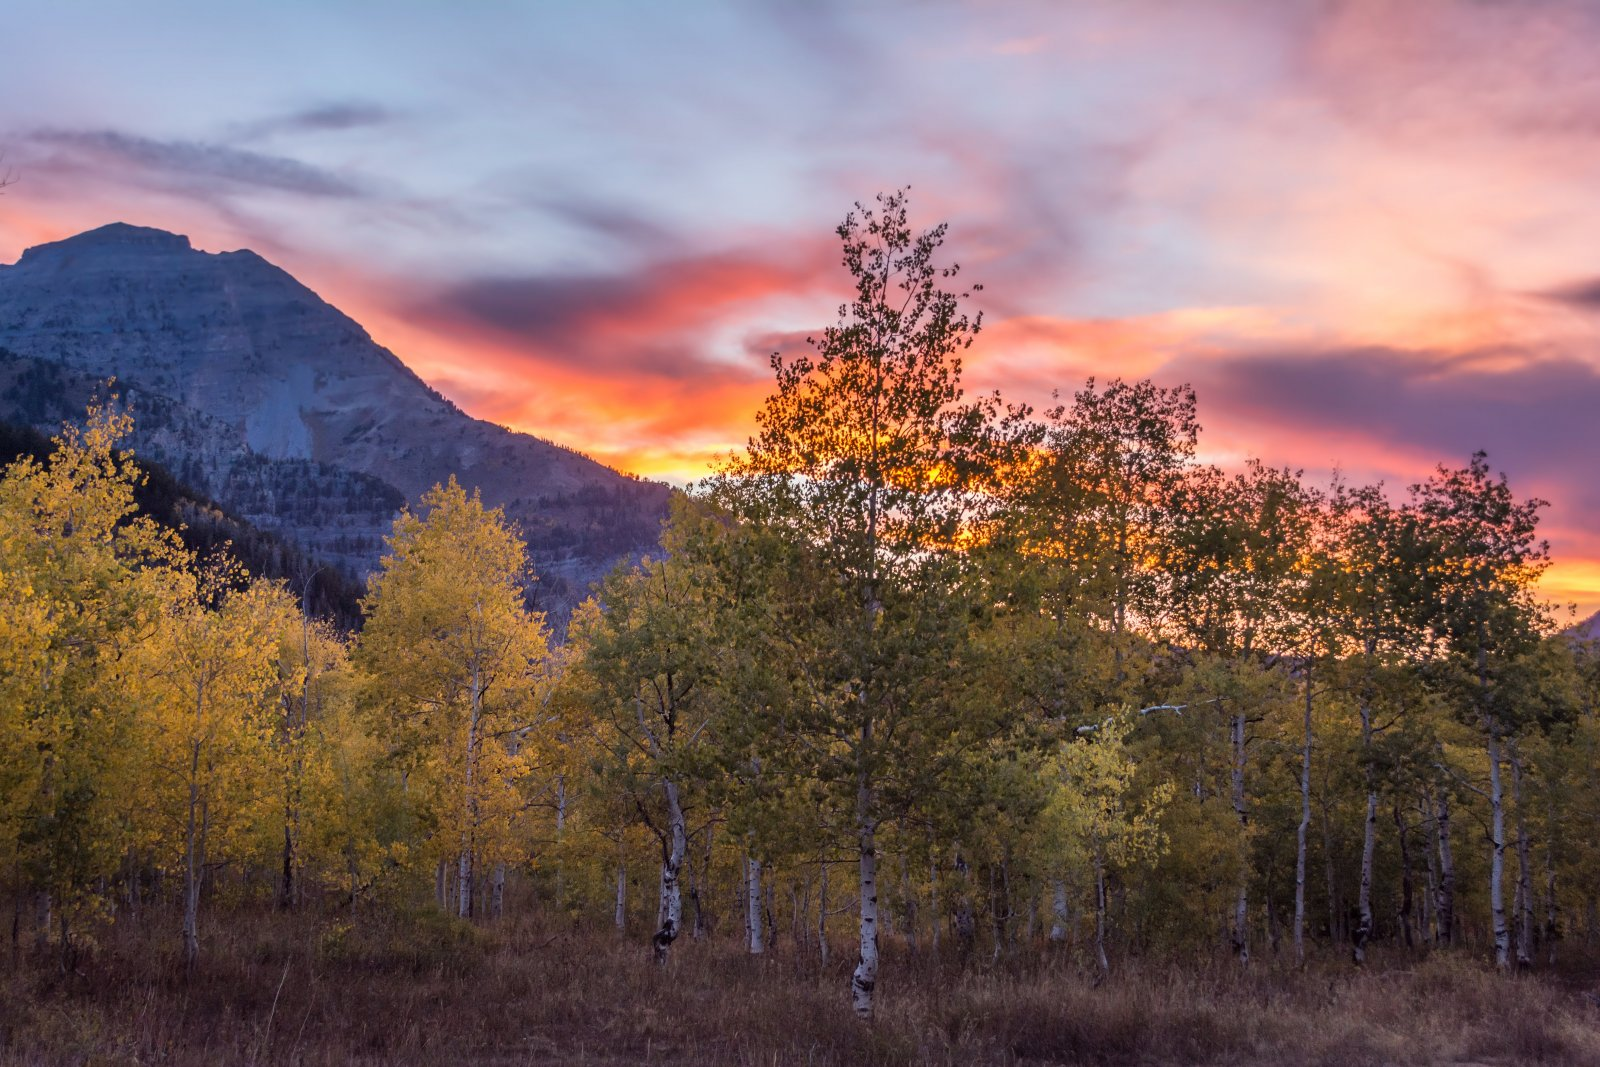 Ridge Autumn Leaves 9-20180605-noise.jpg